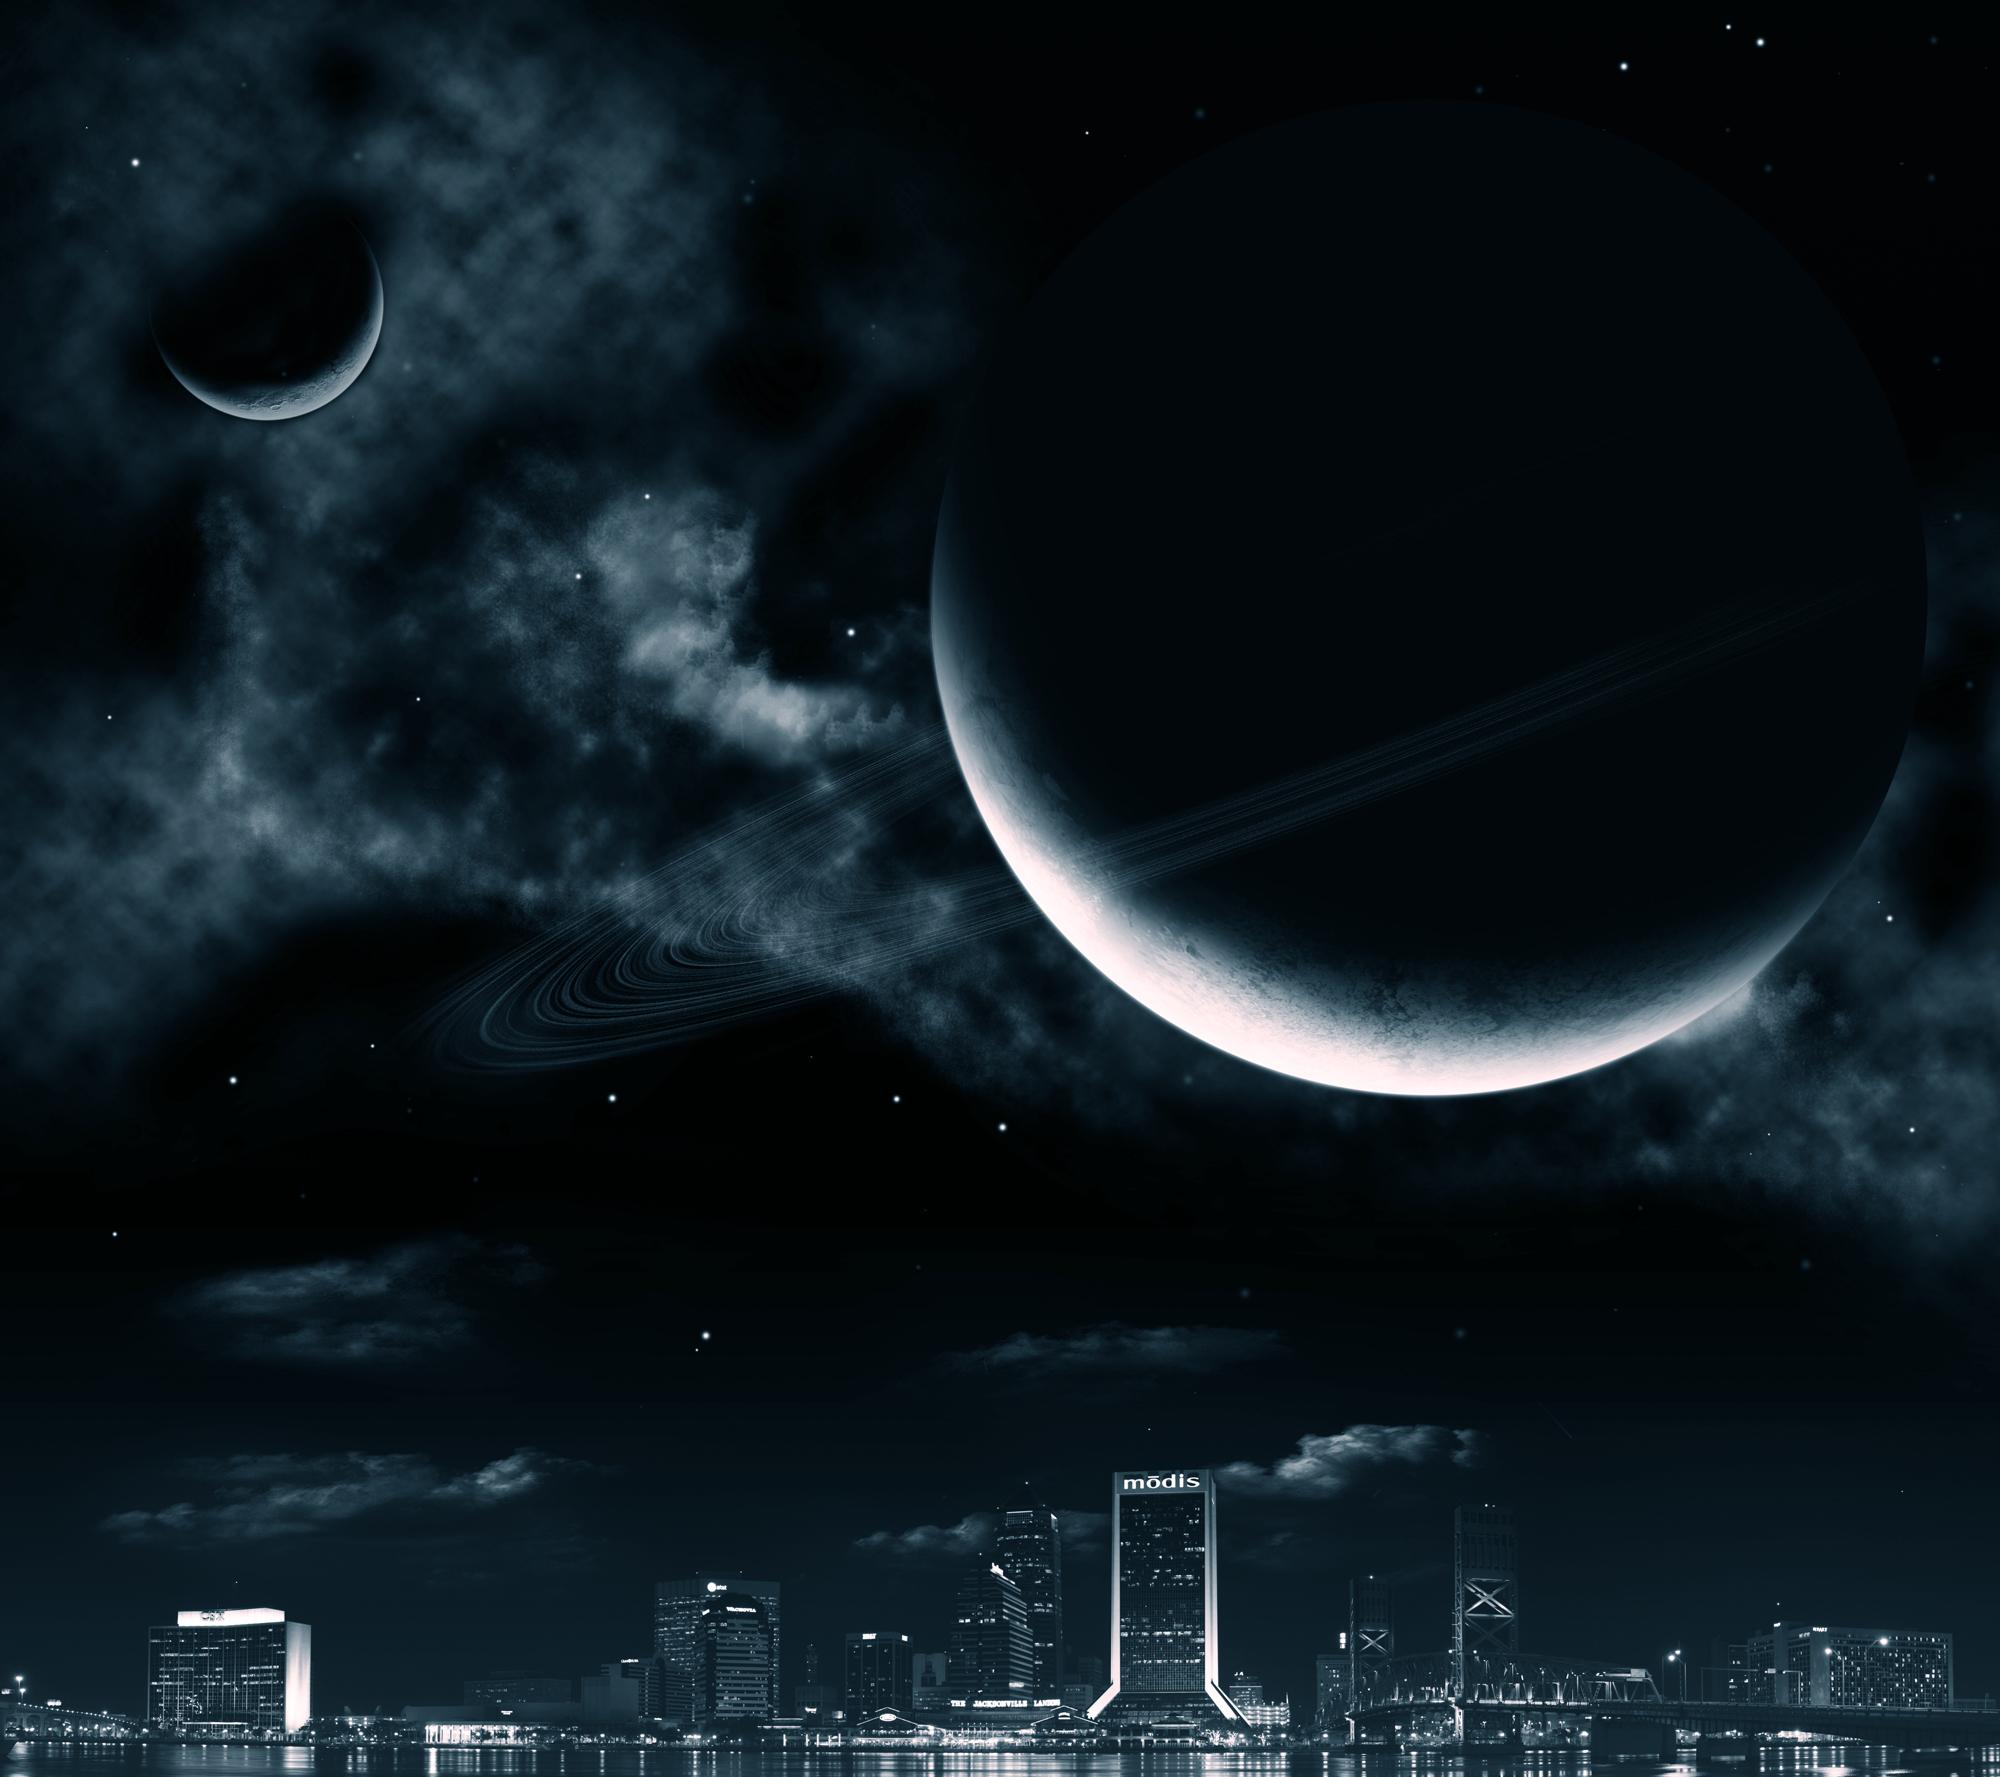 Good Night Wallpaper: Goodnight Wallpapers